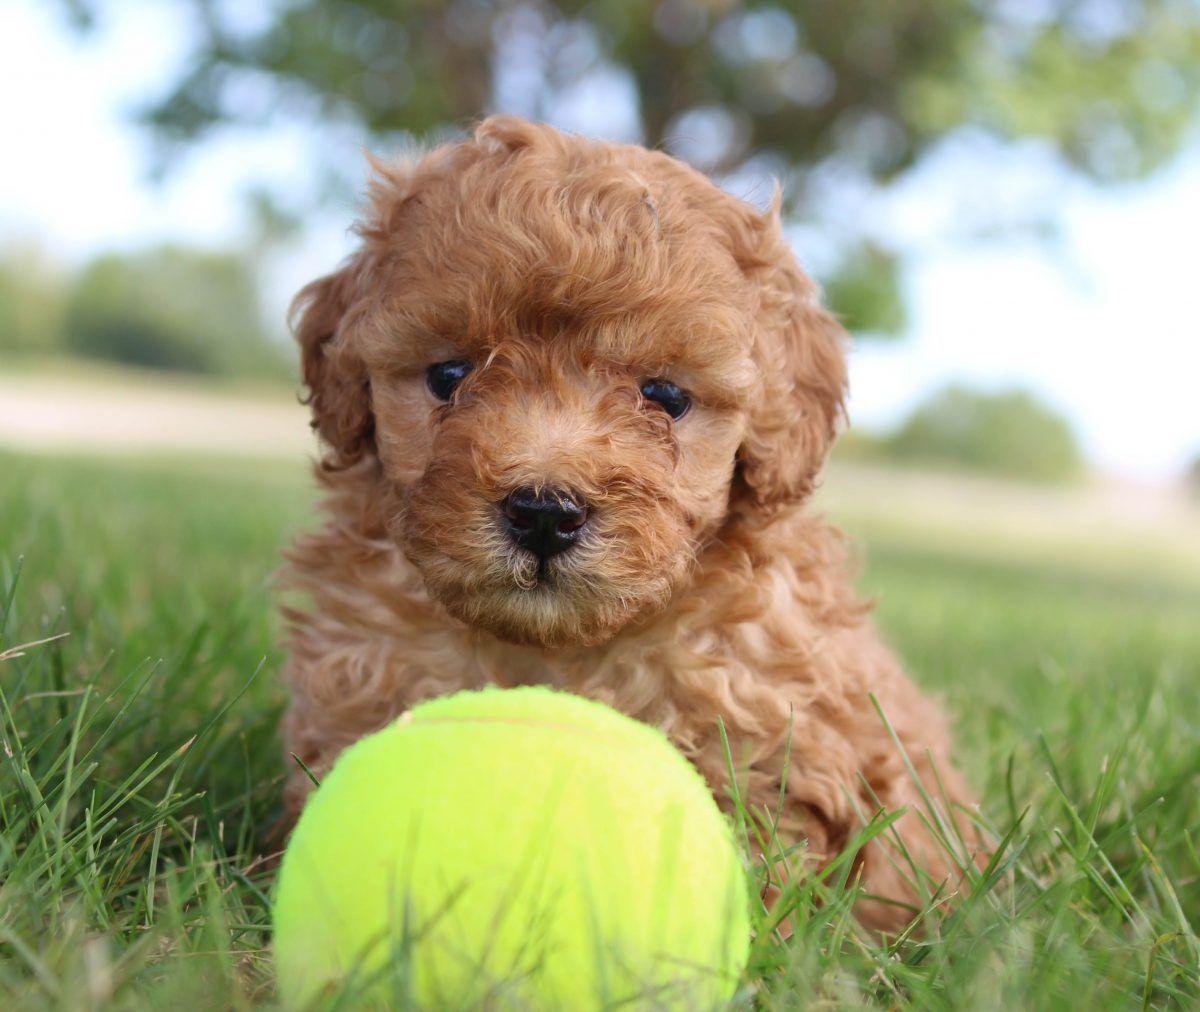 Parr Puppy Miniature Poodles For Sale In Shipshewana Indiana Poodle Puppy Miniature Poodle Puppy Poodle Dog